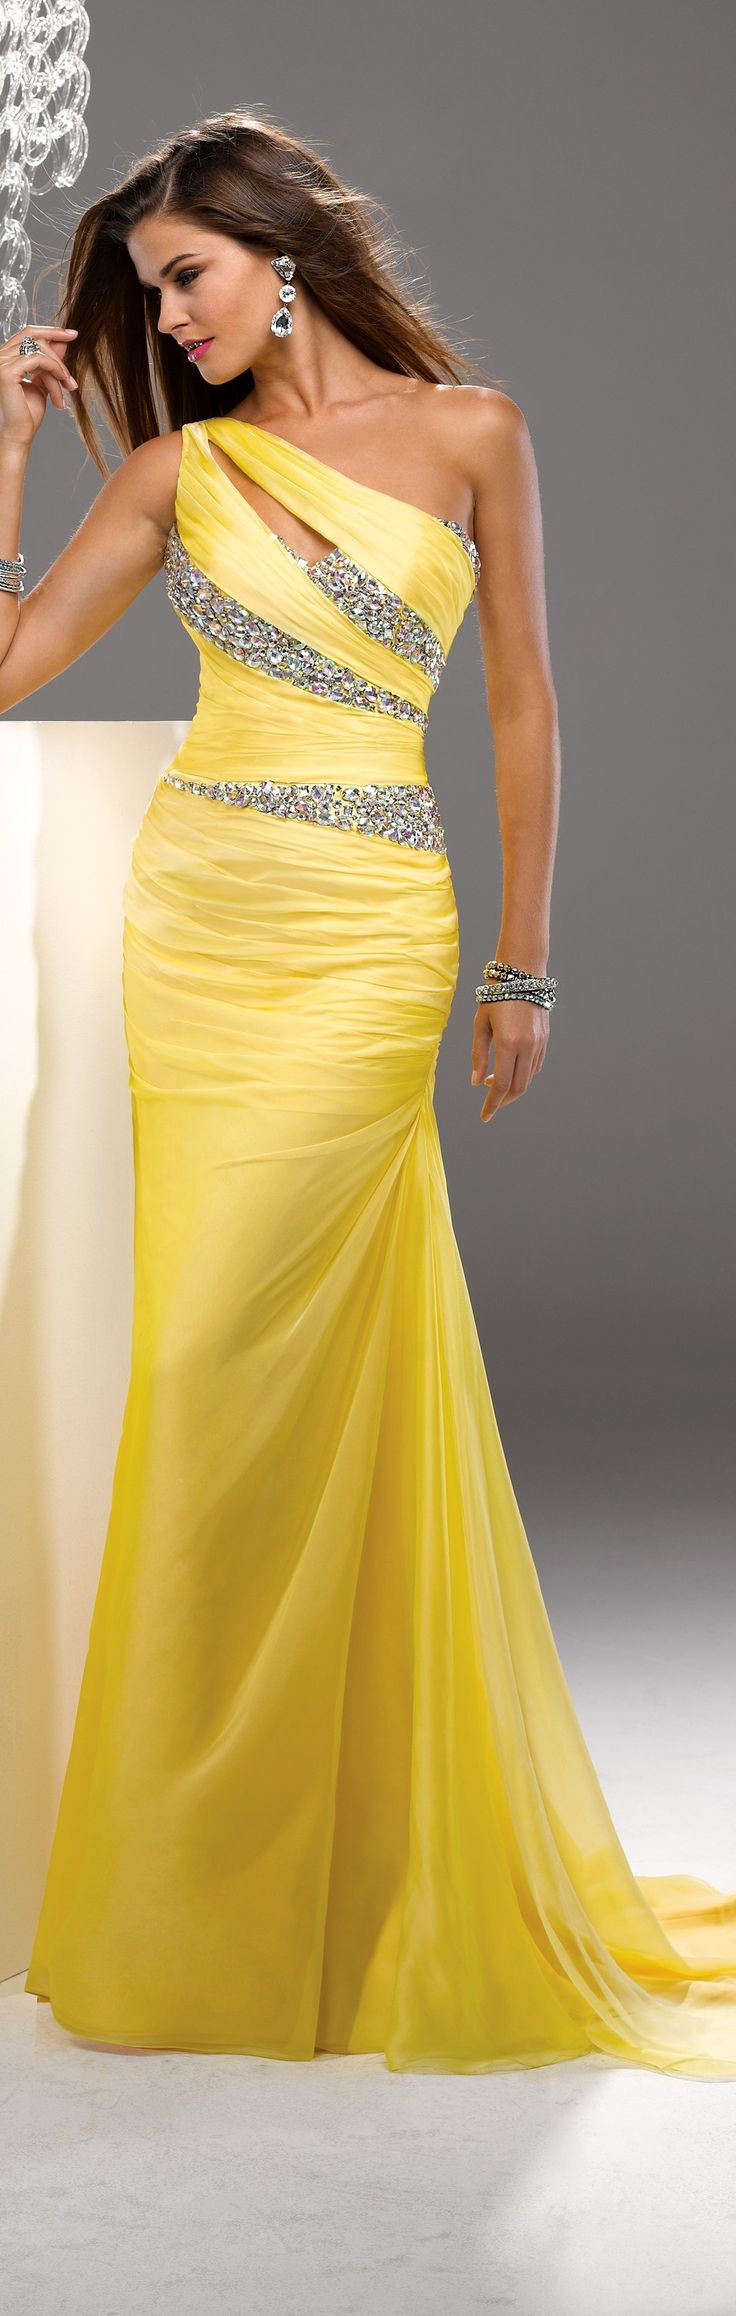 best fashion design images on pinterest cute dresses ball